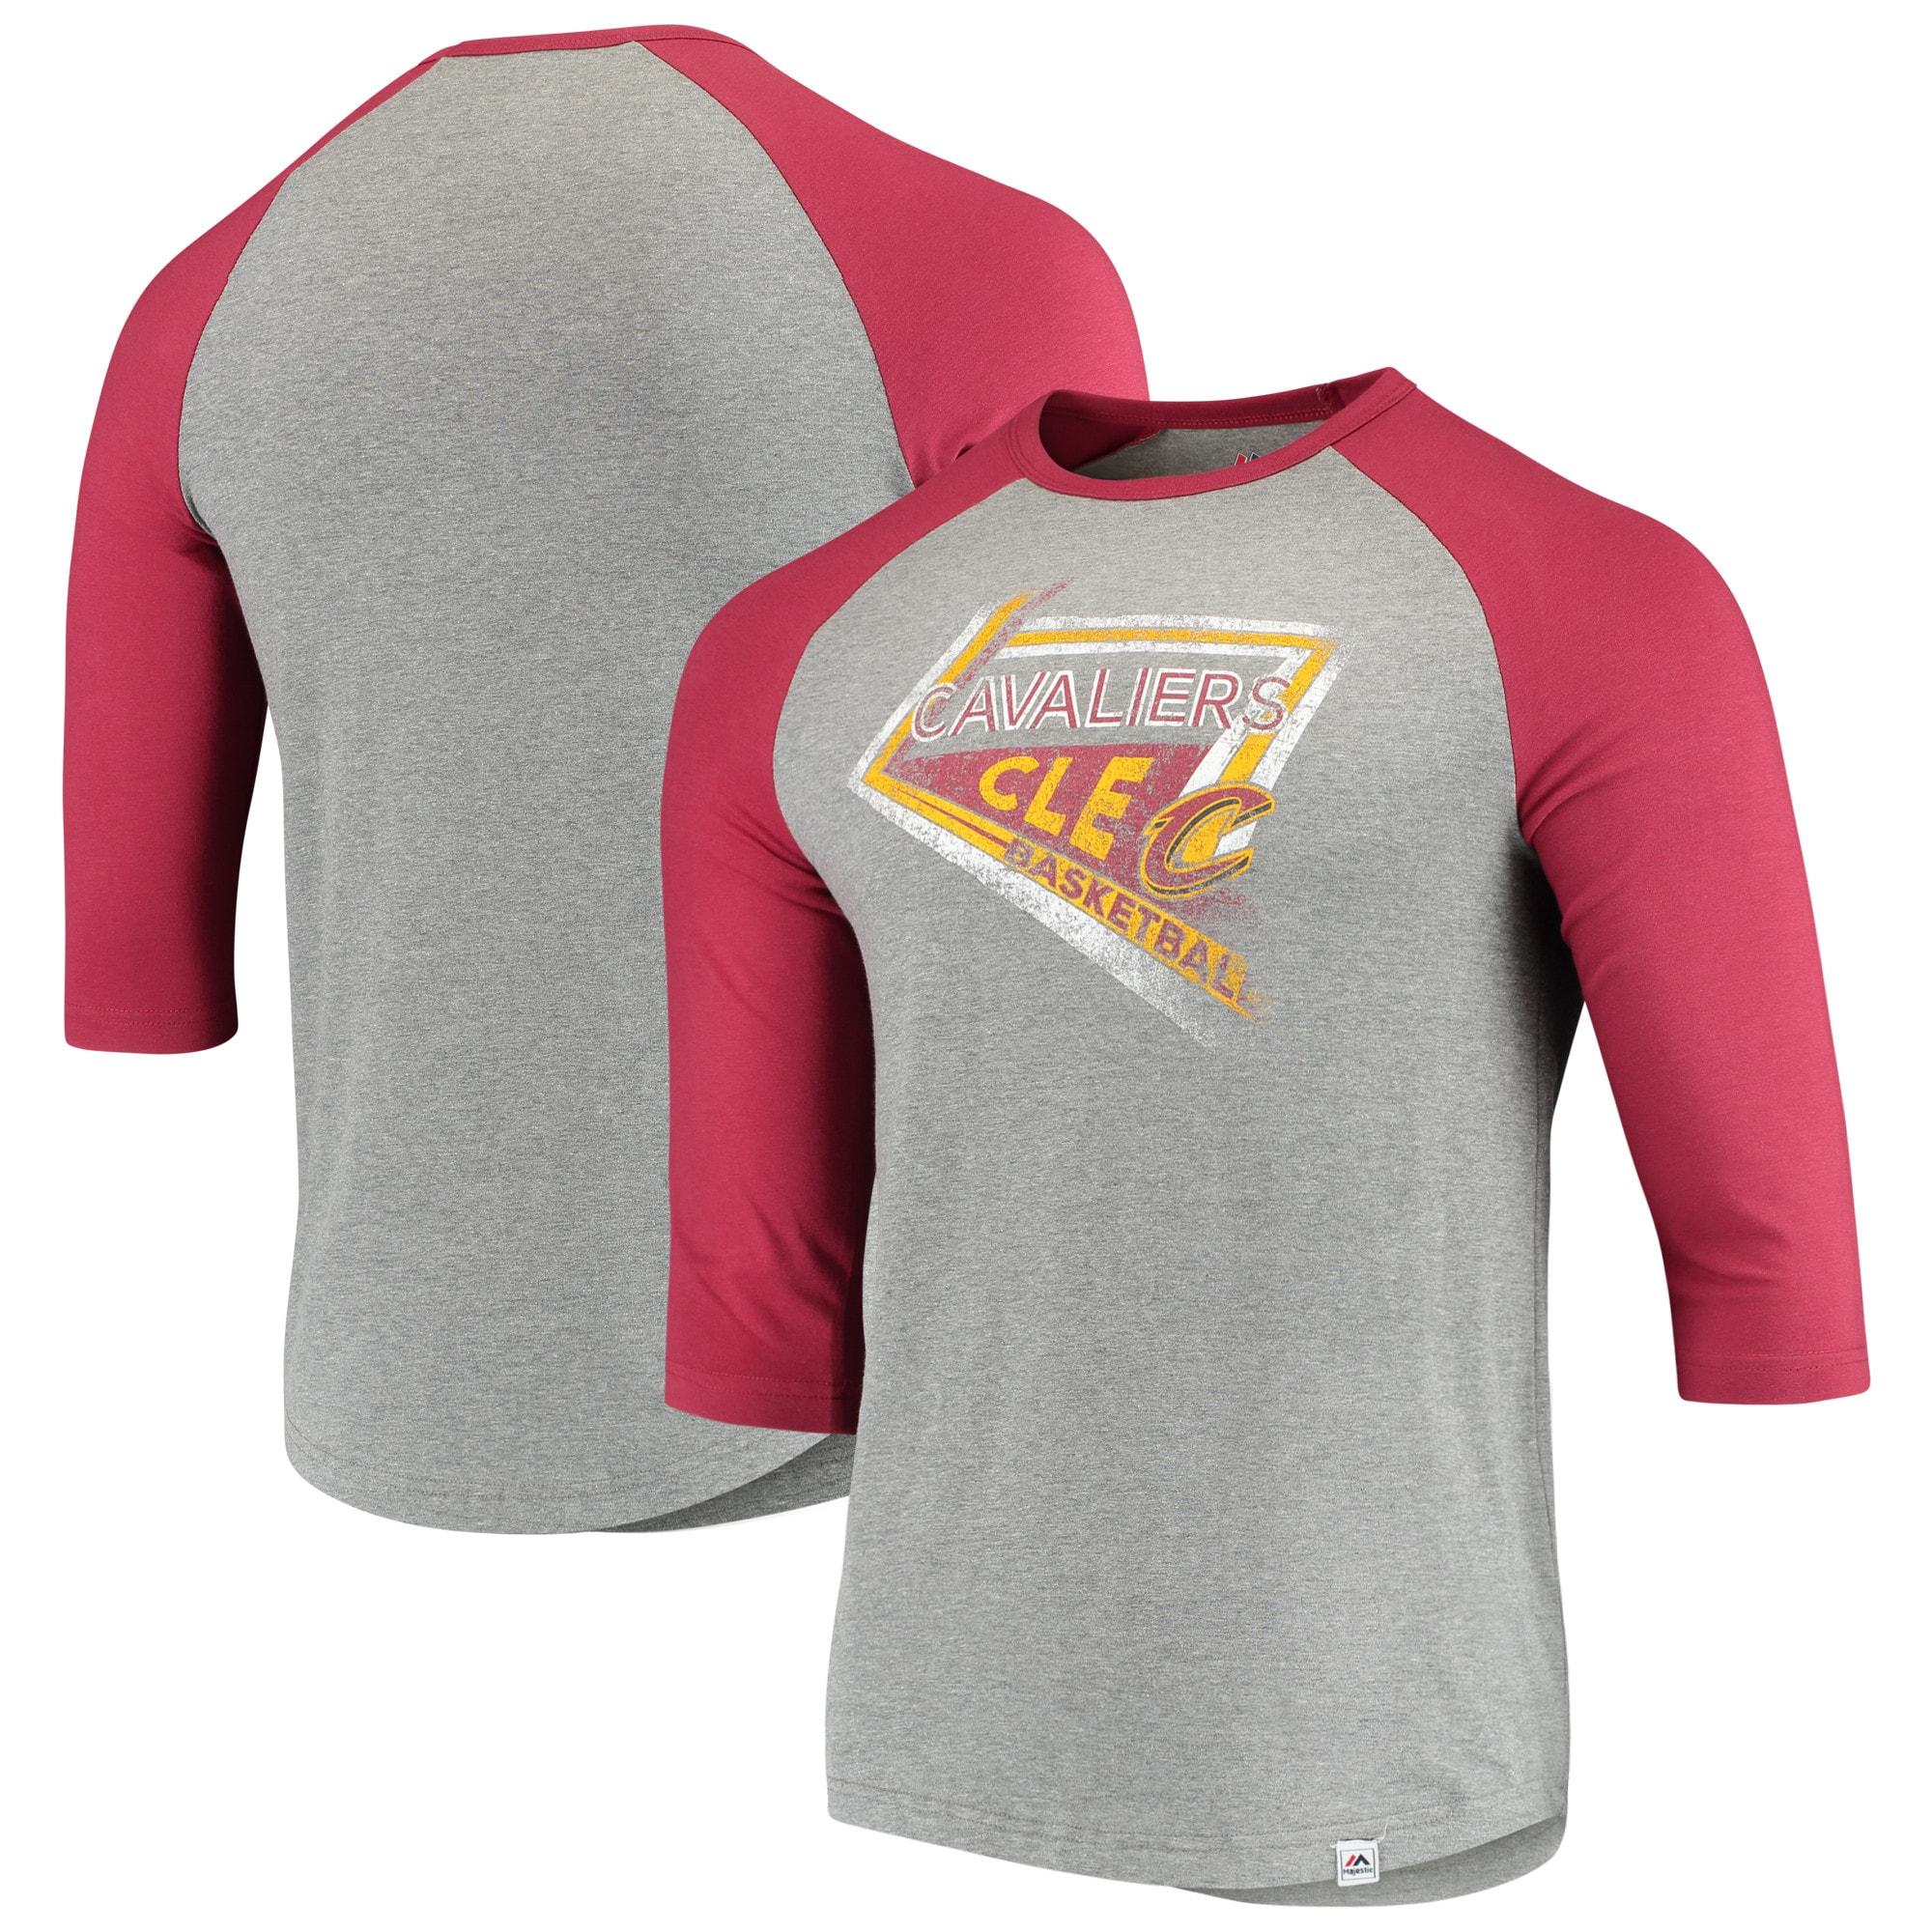 Cleveland Cavaliers Majestic Scoring Position Tri-Blend 3/4-Sleeve Raglan T-Shirt - Heathered Gray/Wine